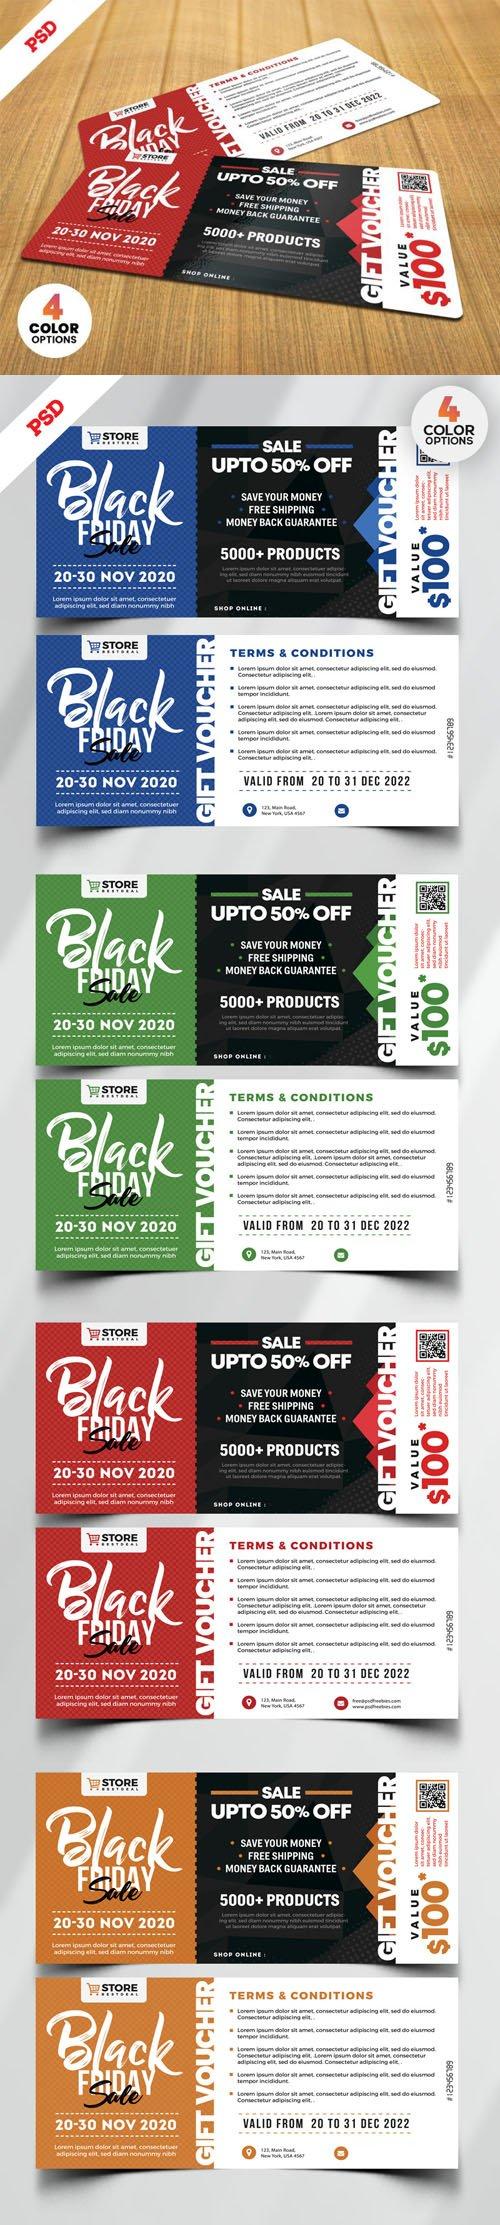 Black Friday Sale Voucher Design PSD Templates